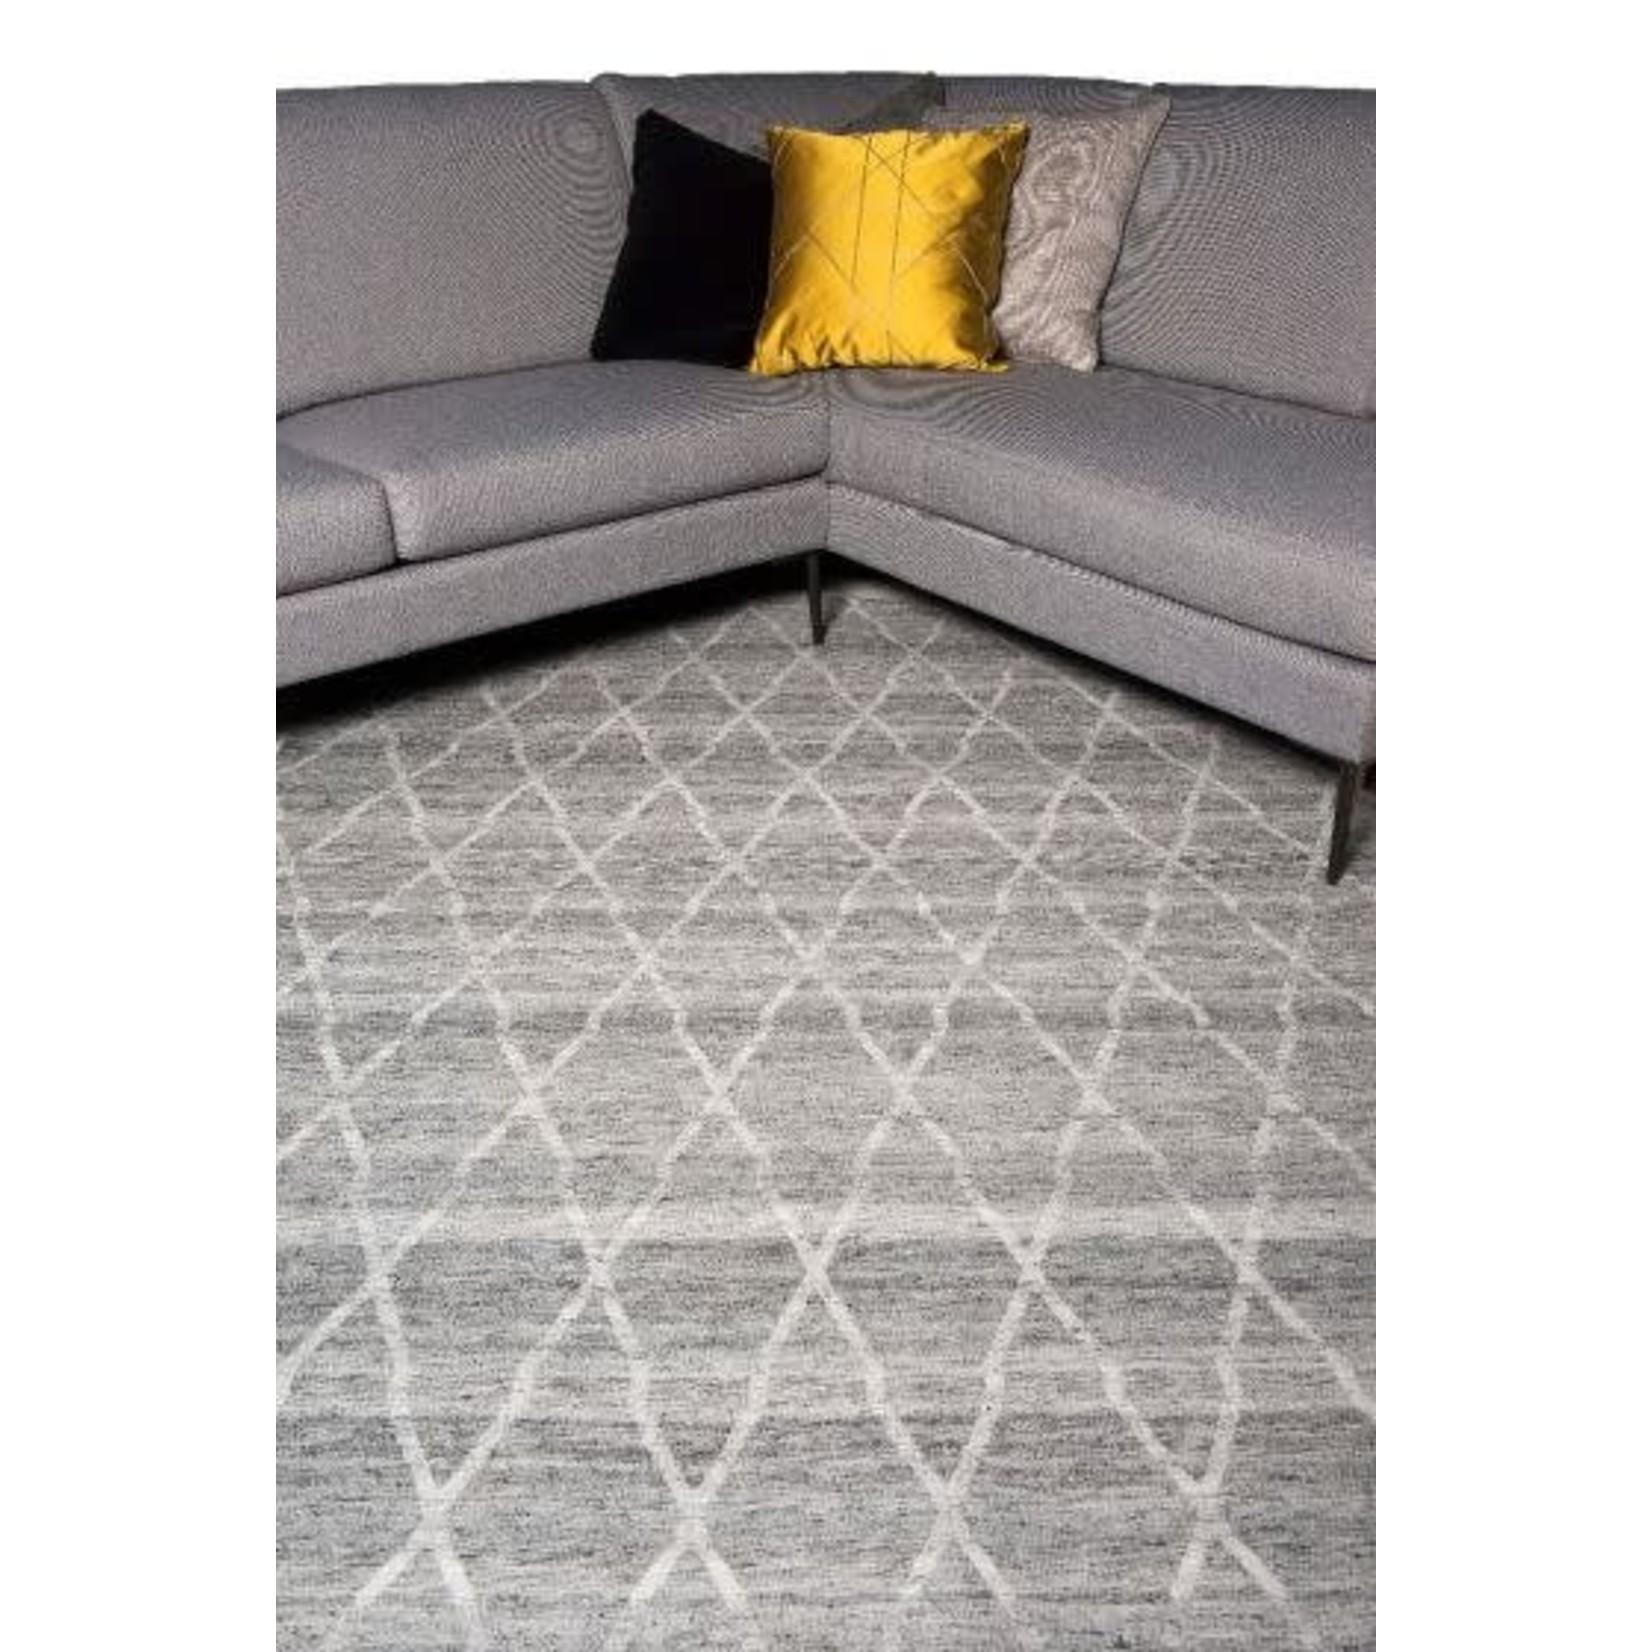 Brinker Carpets Brinker carpet Sjock Smoke